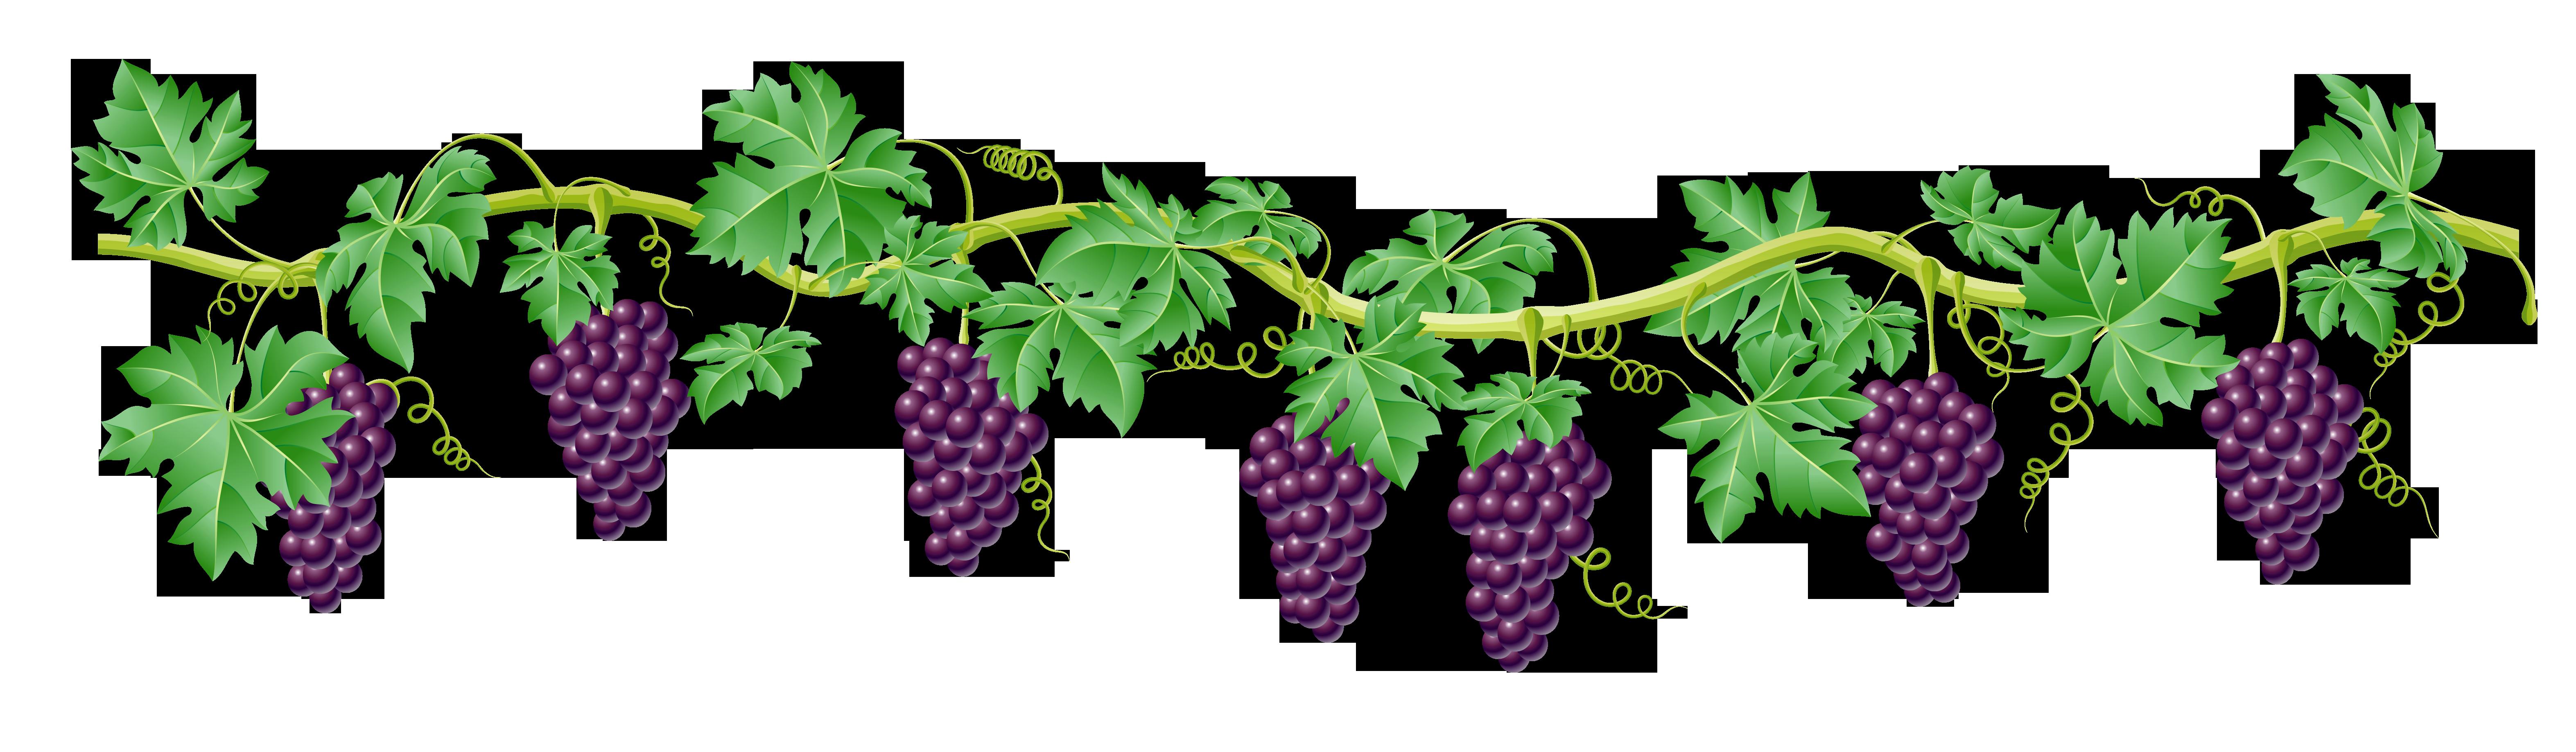 Vine cross clipart image transparent 28+ Collection of Grape Vines Clipart | High quality, free cliparts ... image transparent